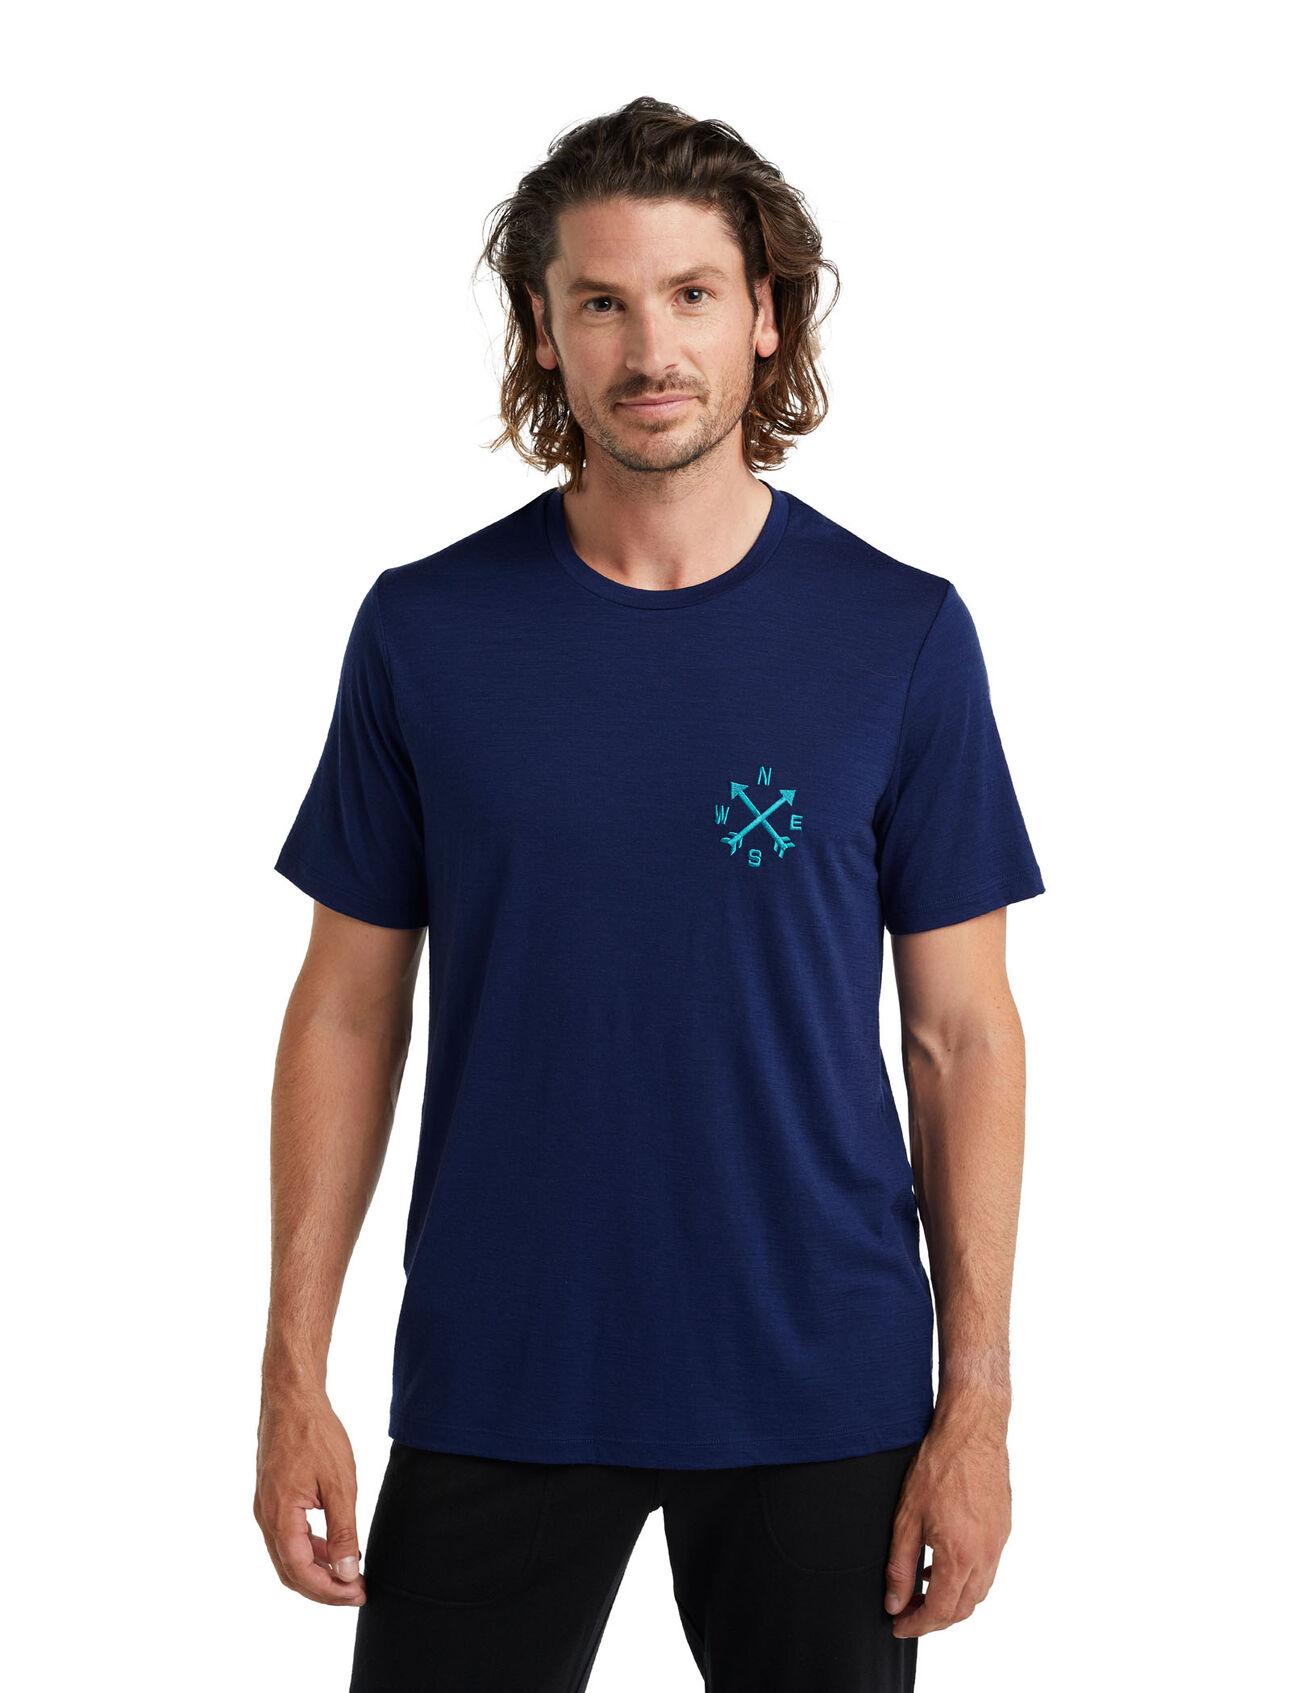 Merino Tech Lite II Short Sleeve T-Shirt Nonetwork